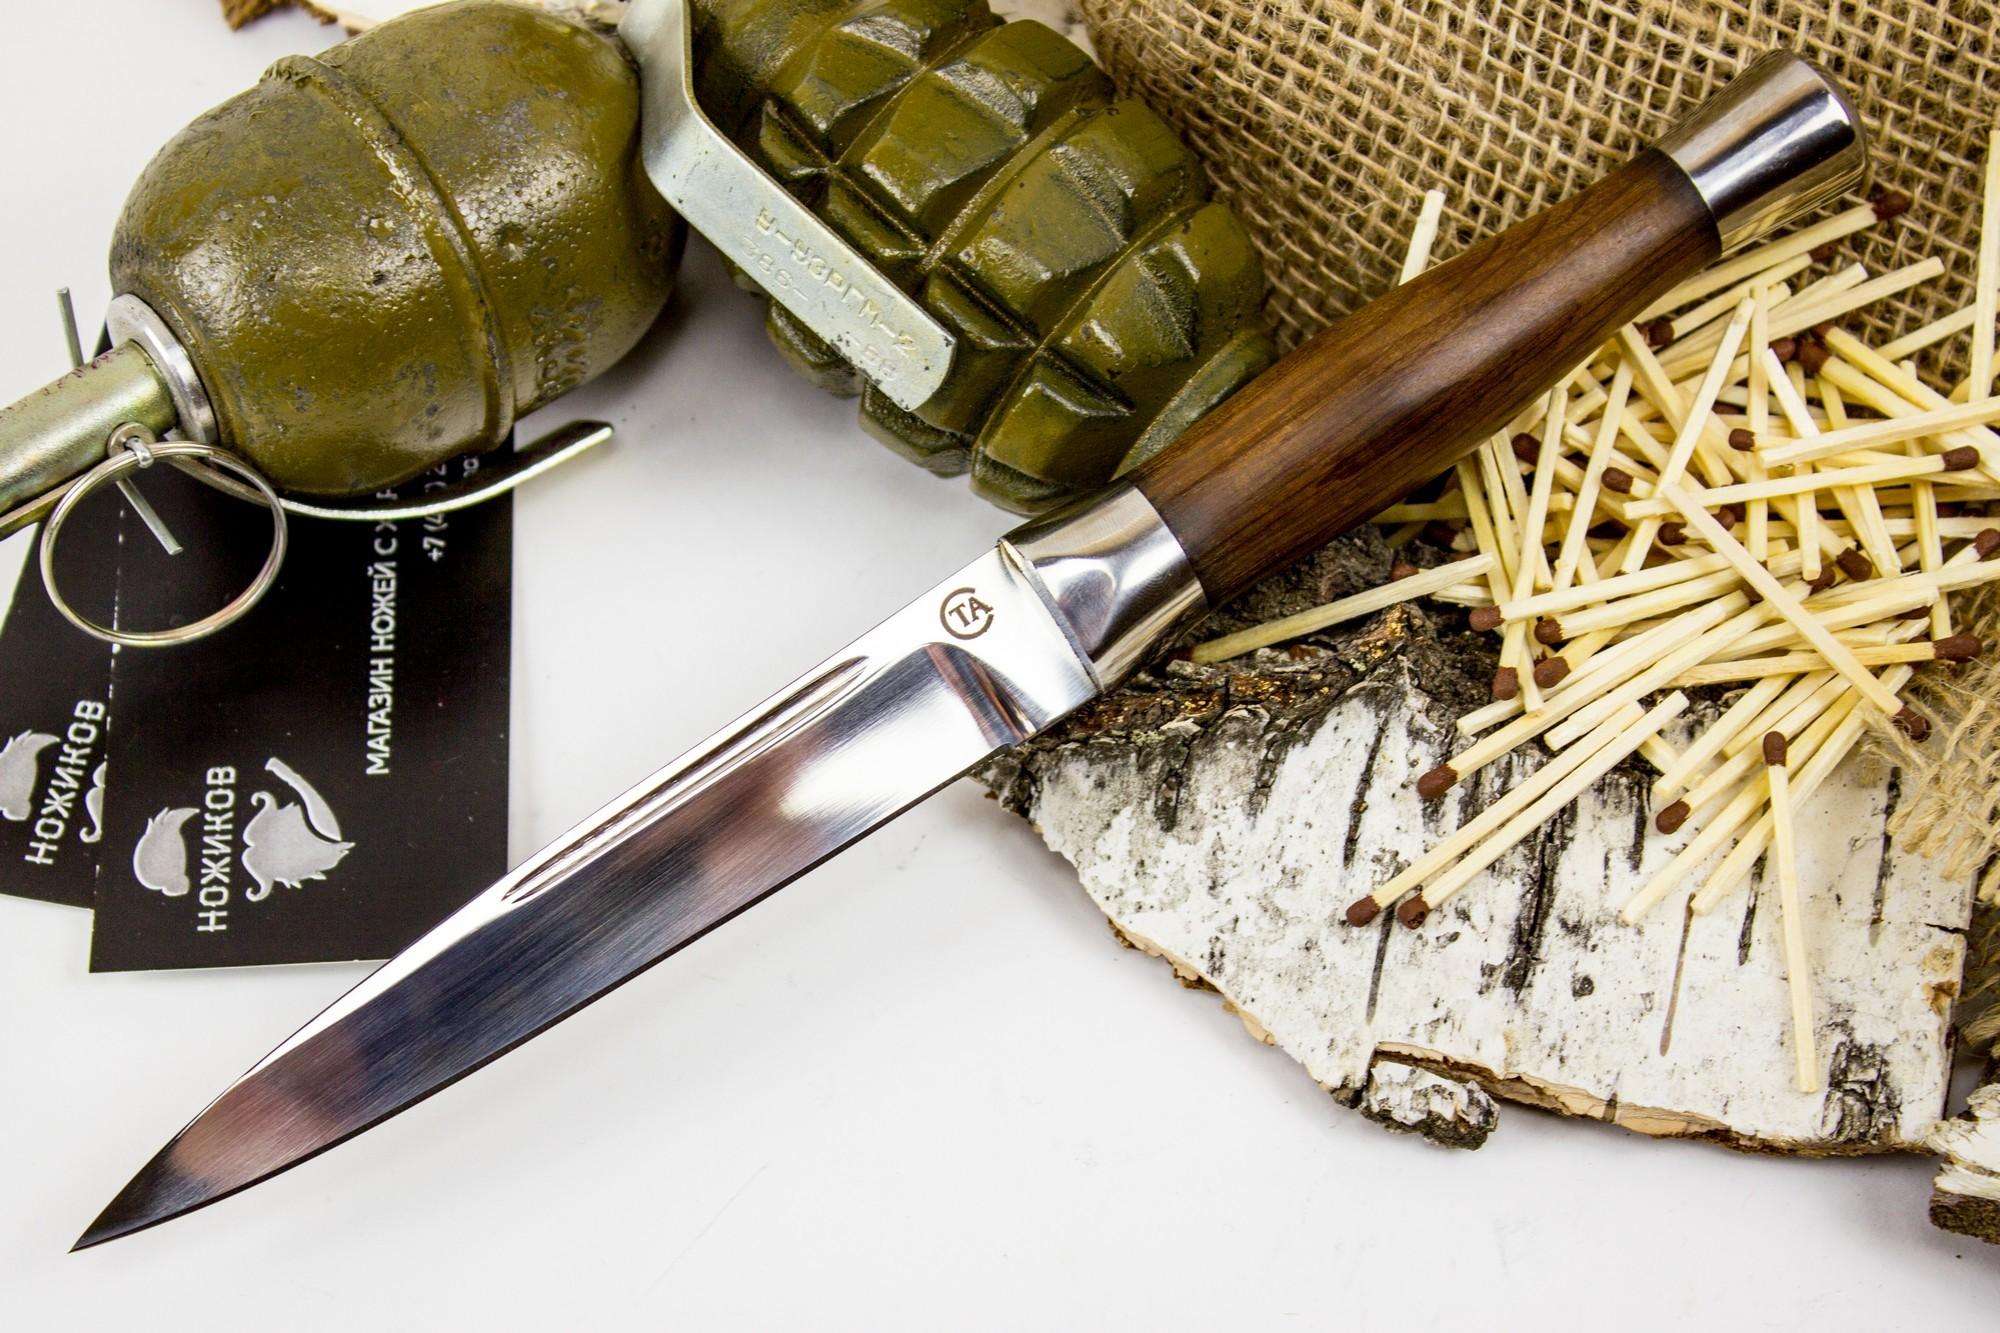 Фото 5 - Нож Горец-3М, сталь 95х18 от Титов и Солдатова